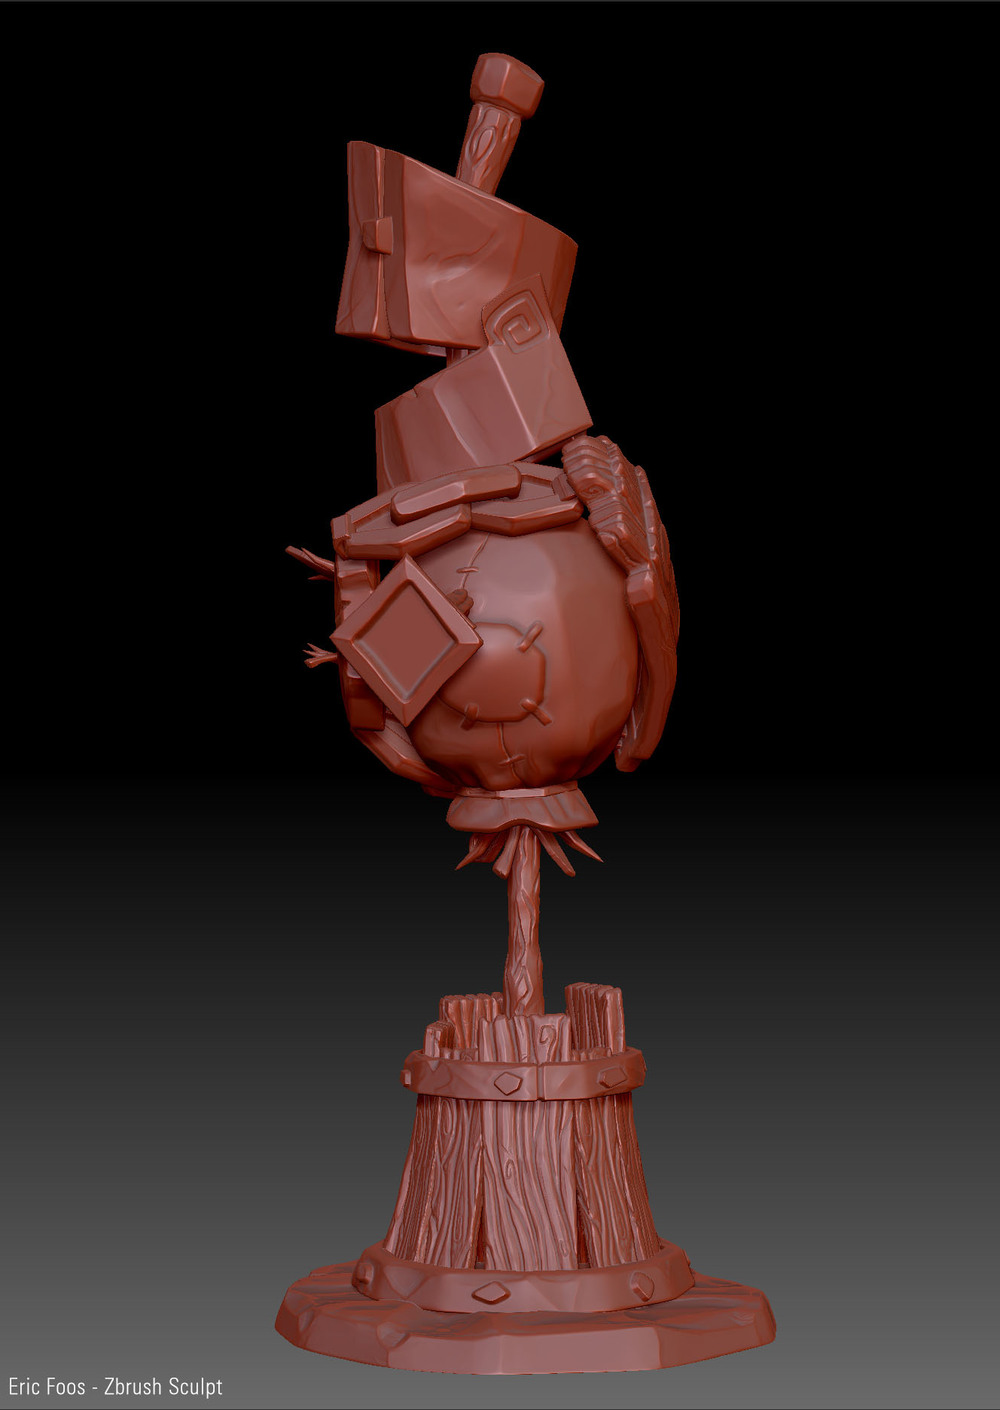 Foos-Zbrush-Sculpt2c.jpg